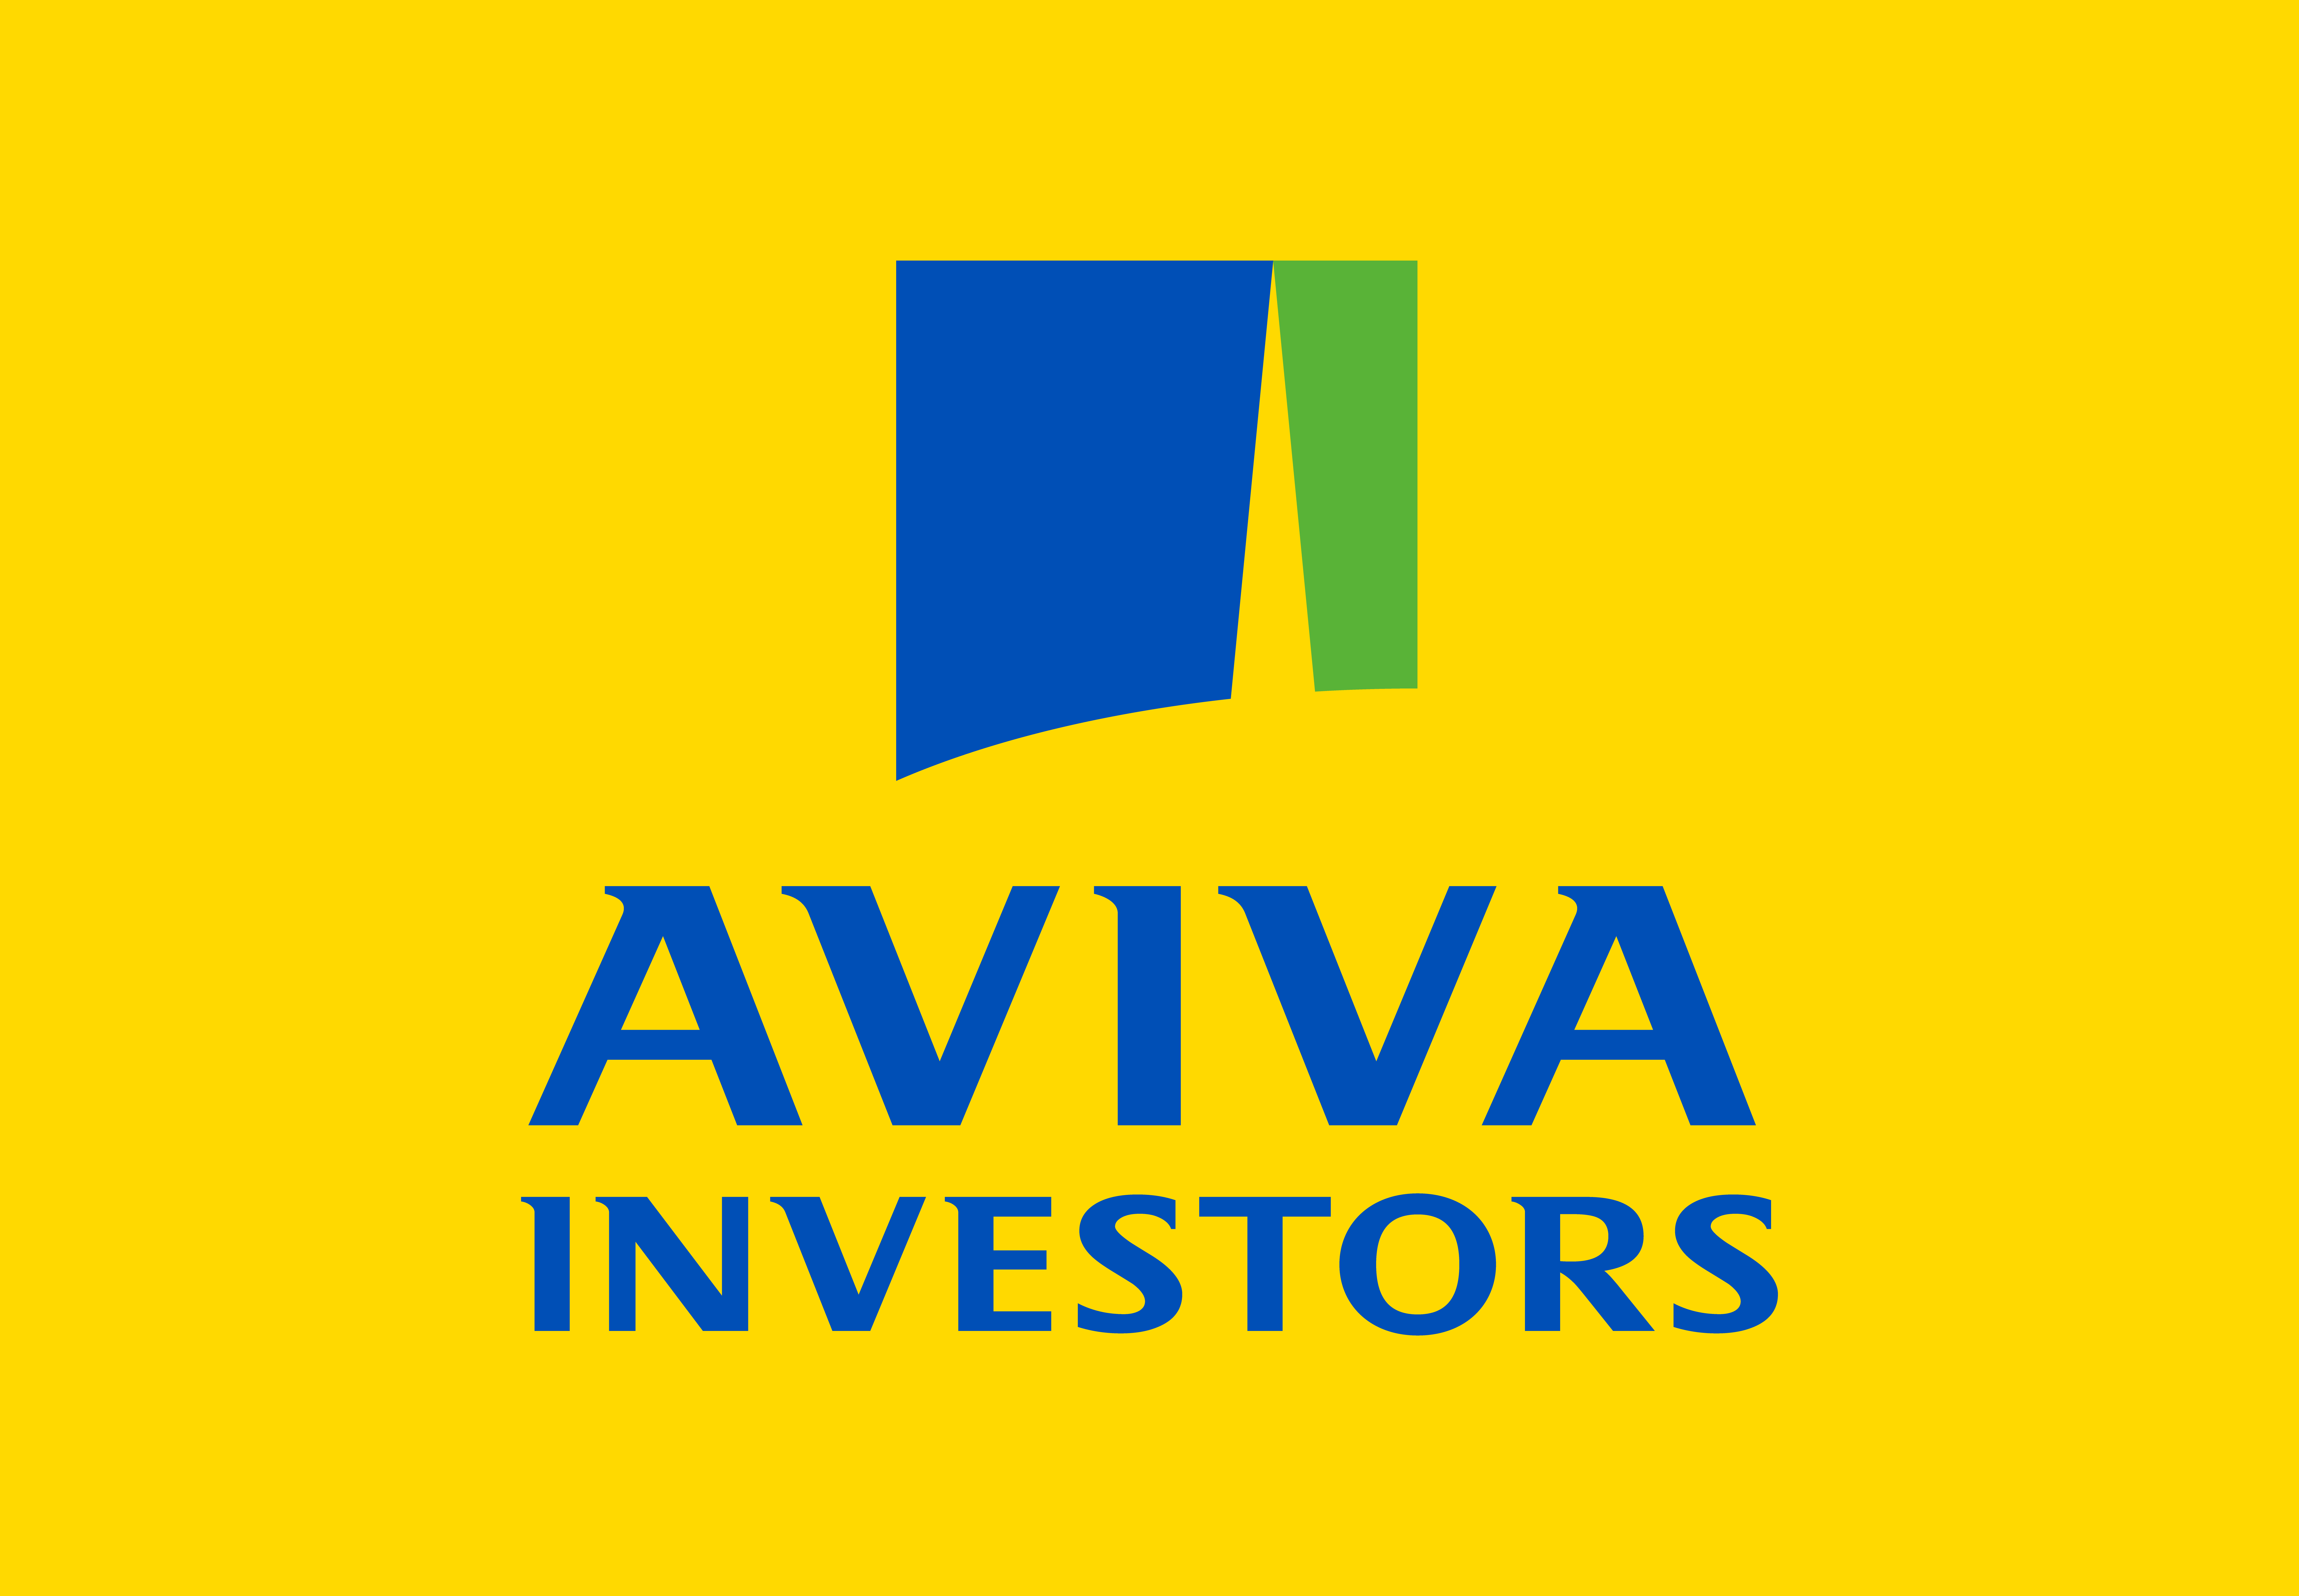 https://s3.amazonaws.com/si-interactive/prod/ai-cio-com/wp-content/uploads/2019/04/30170054/aviva_investors_logo_tab_rgb_primary_horizontal_colour.png